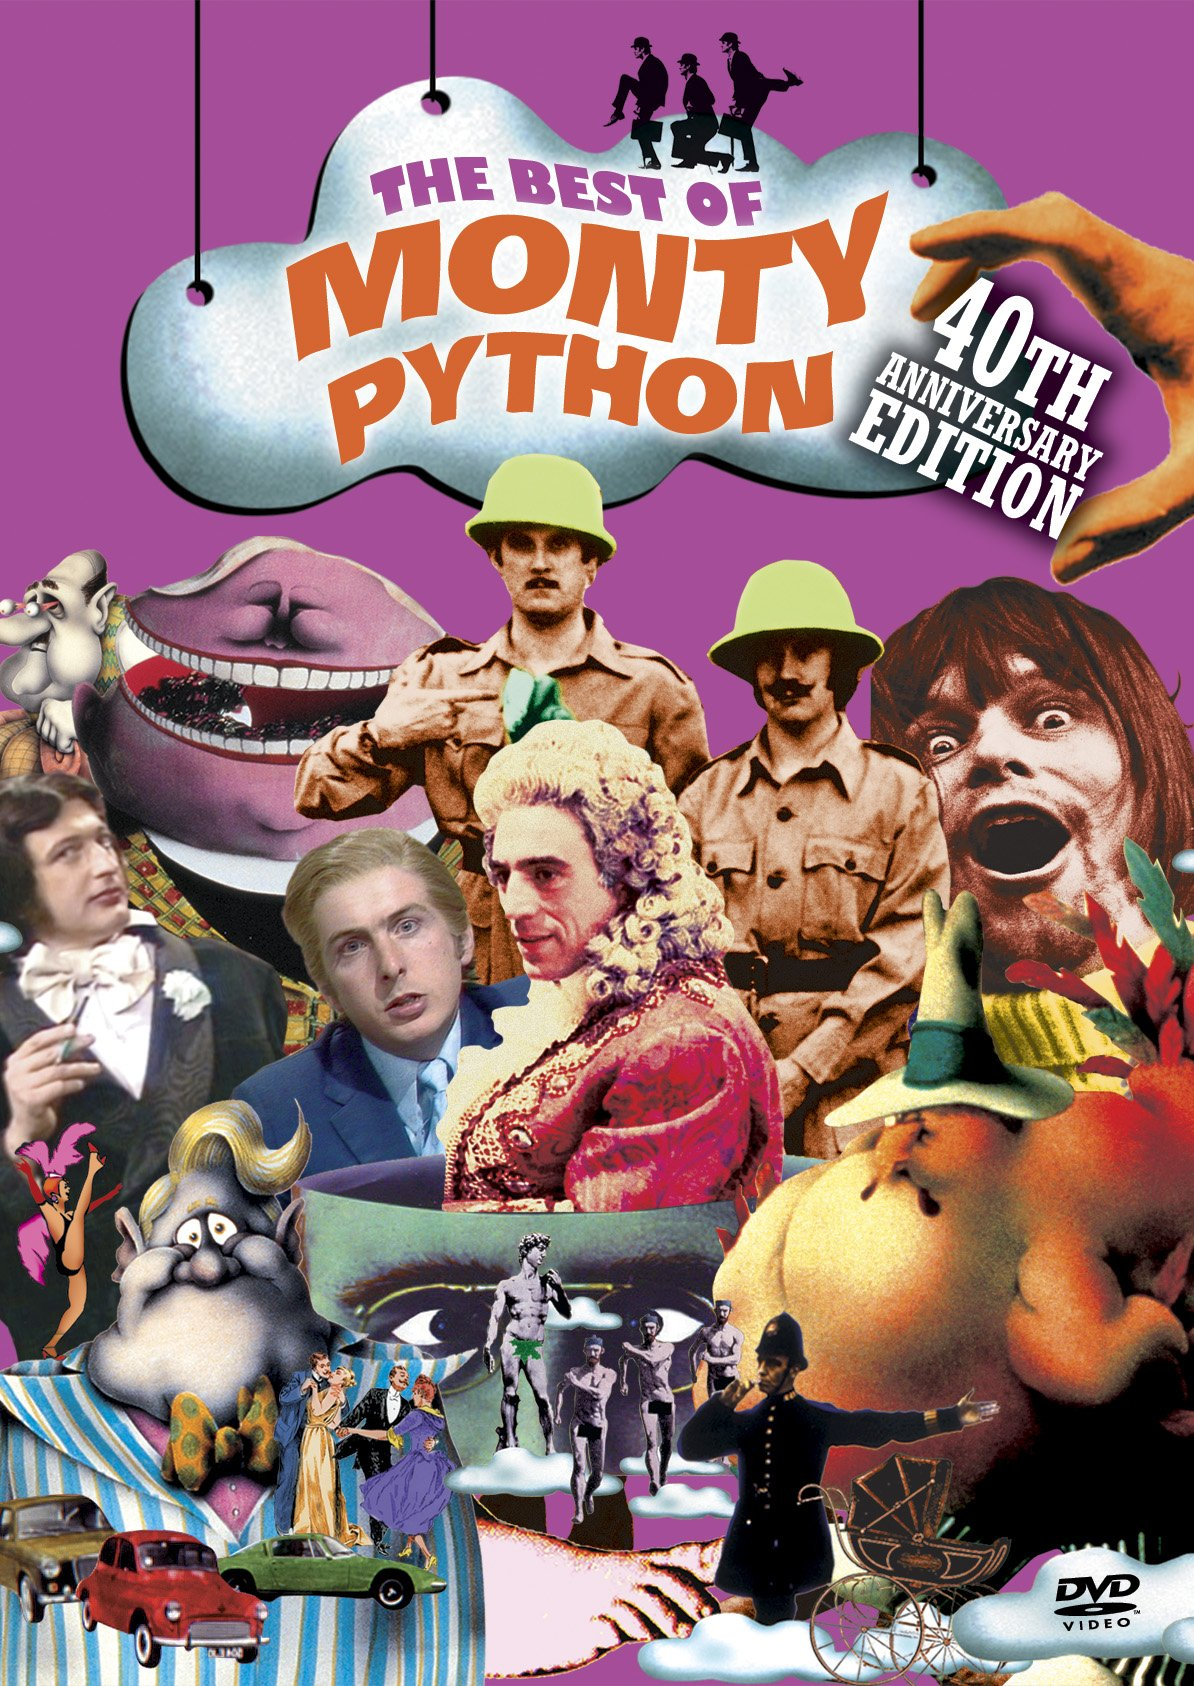 The Best of Monty Python